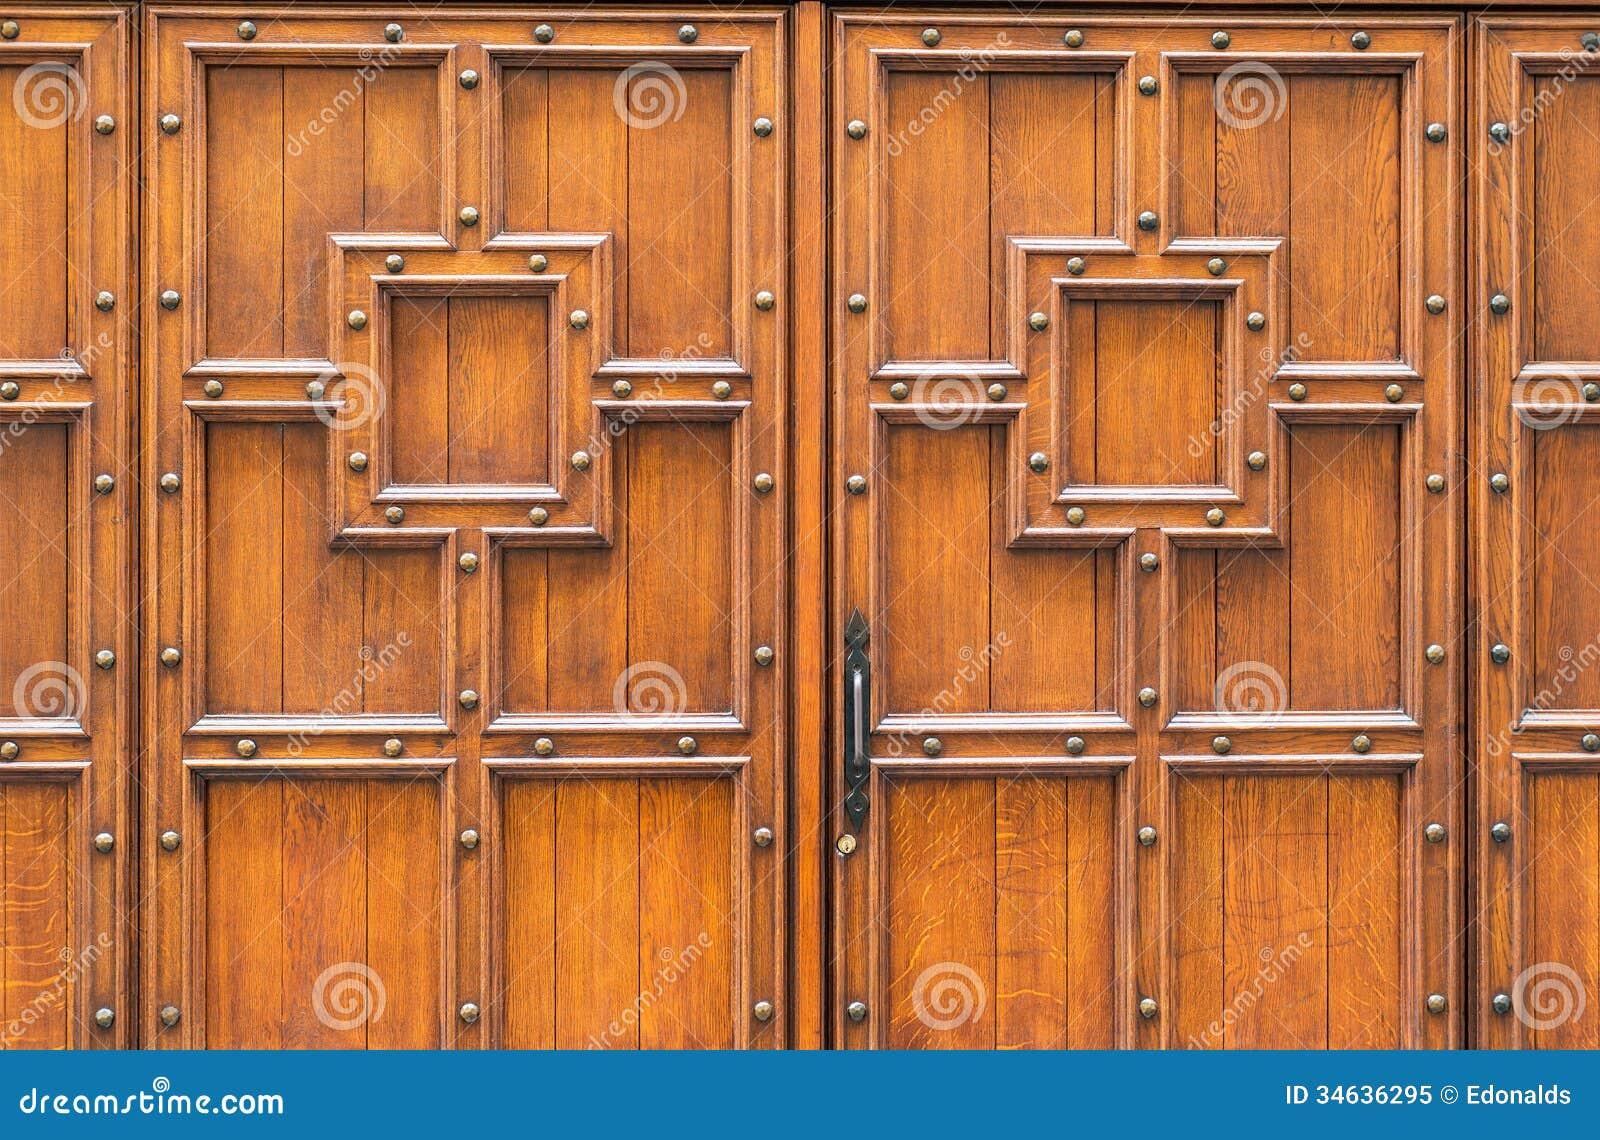 Door Design Royalty Free Stock Photo Image 34636295